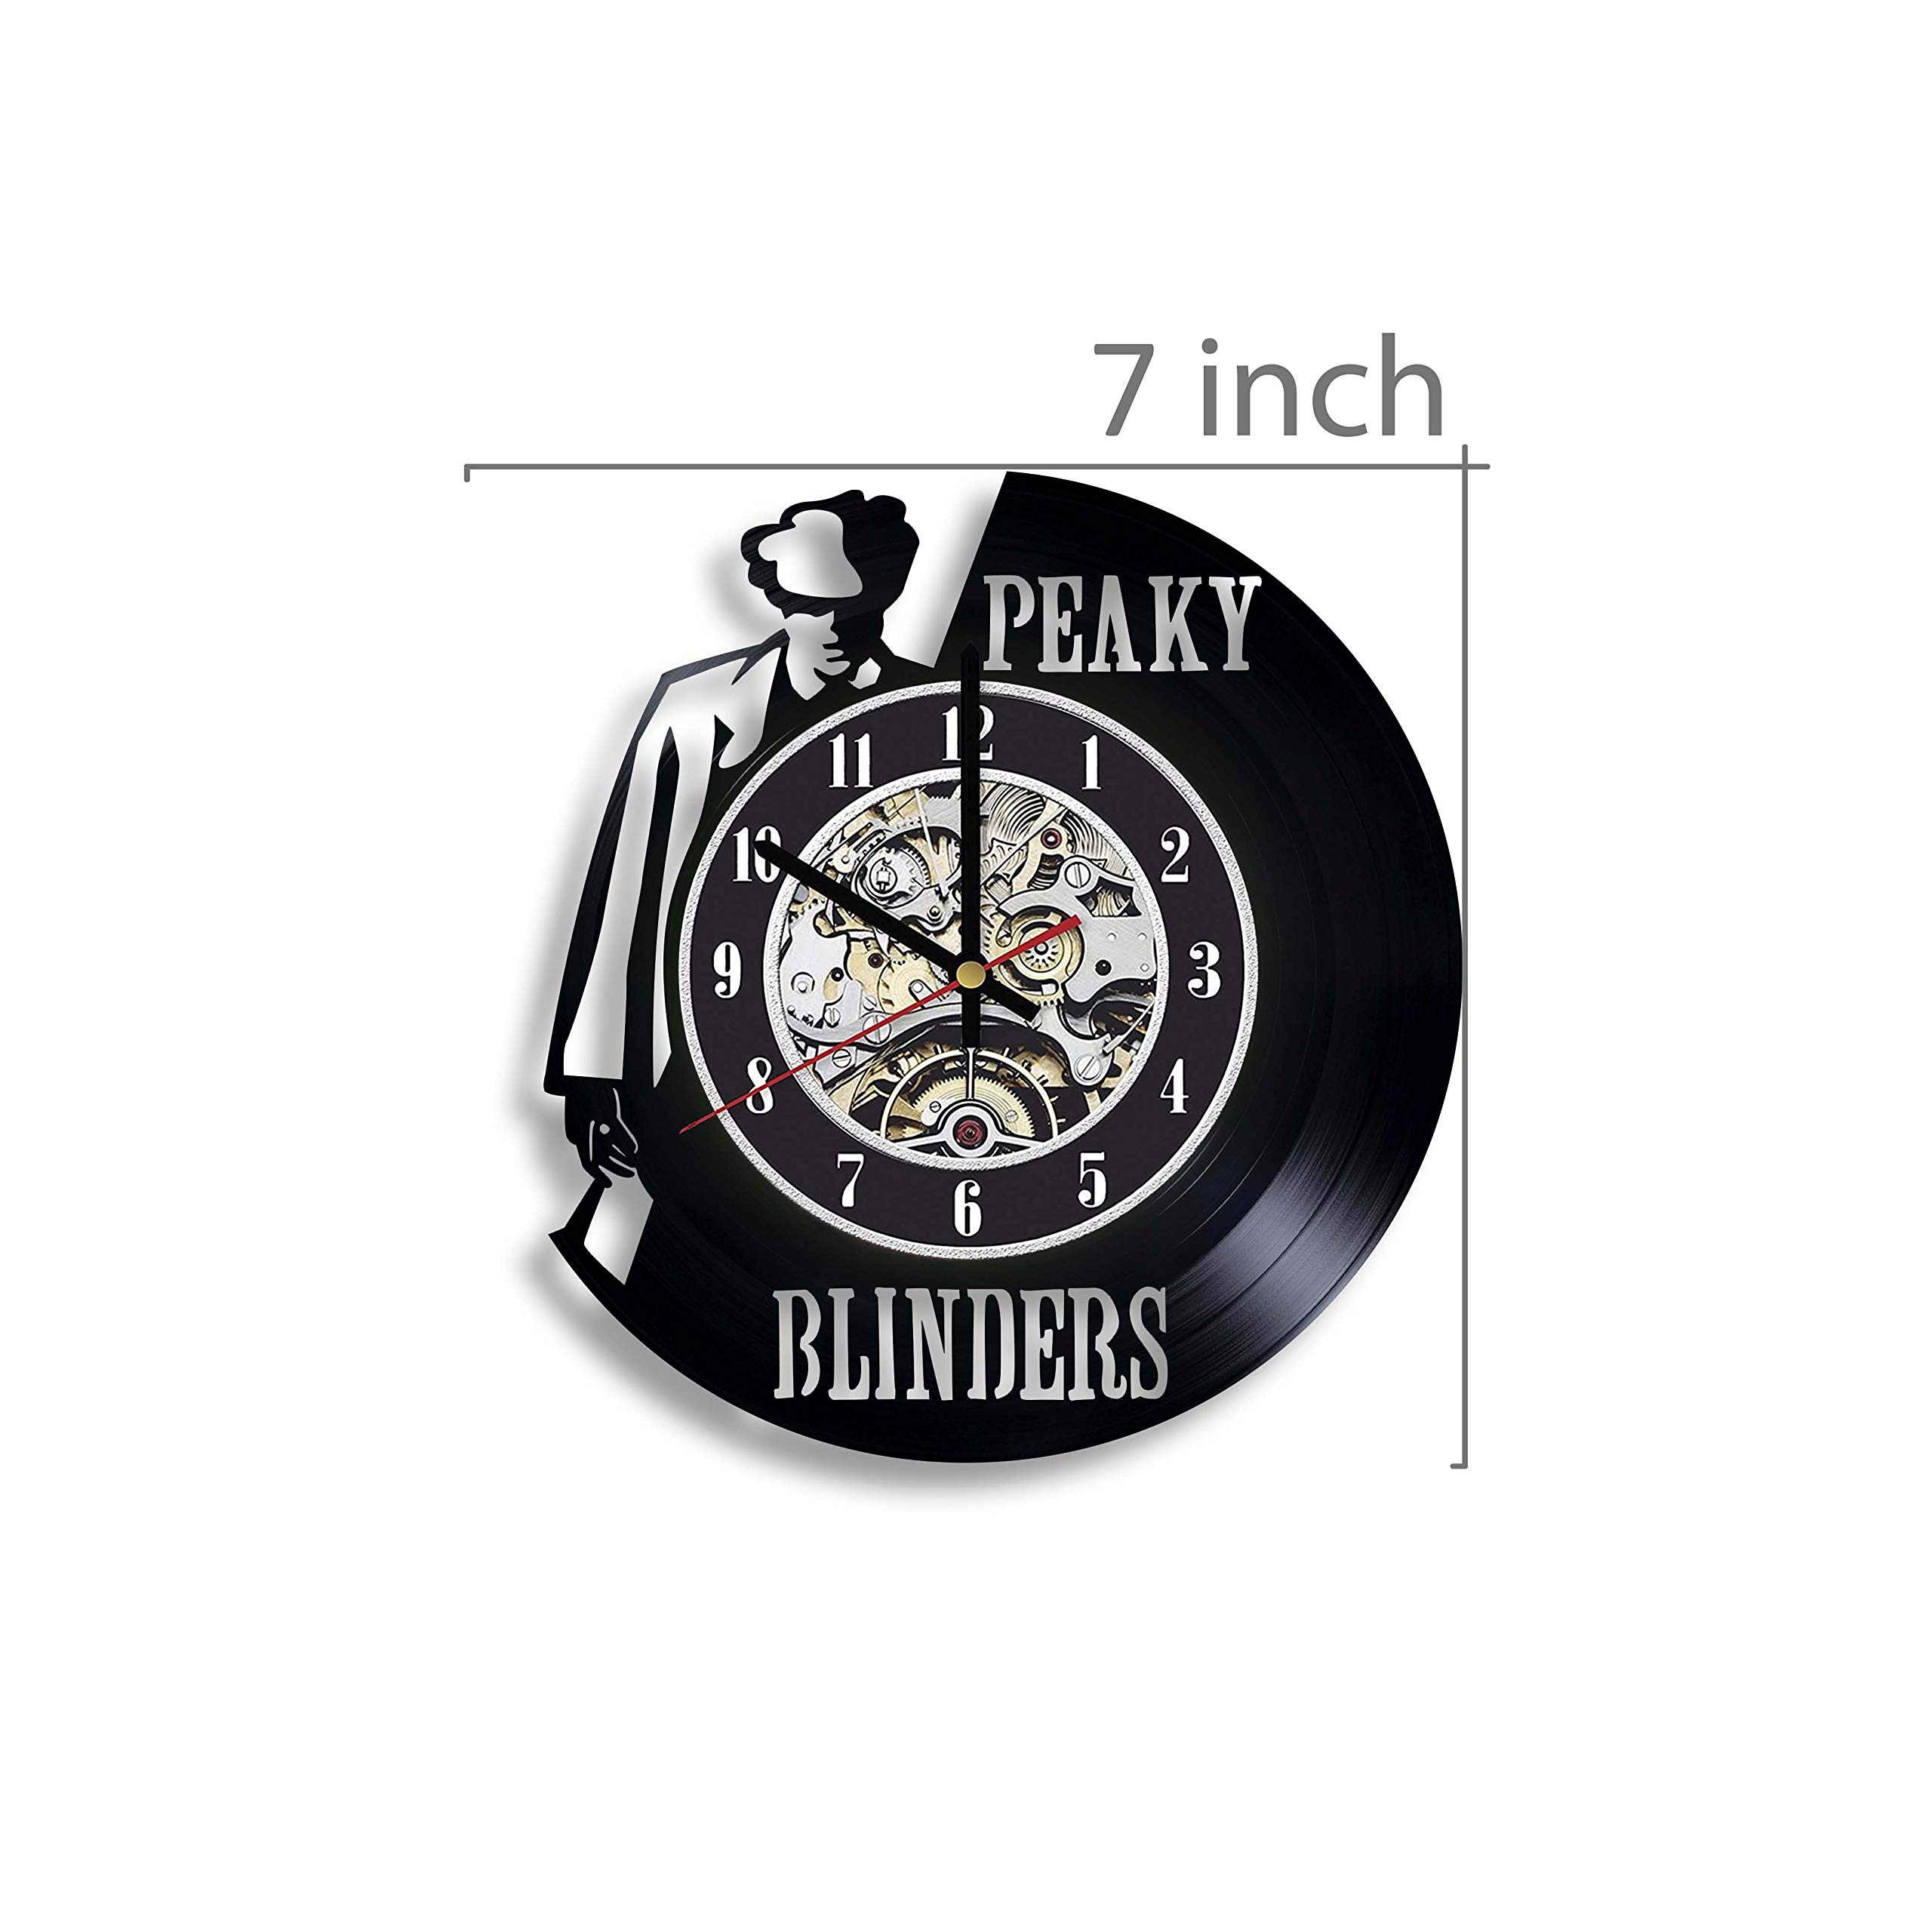 Gifts by N Peaky Blinders Vinyl Record Wall Clock, Peaky Blinders TV  Series, Peaky Blinders Artwork, Peaky Blinders Clock, Thomas Shelby Art,  Peaky Blinders Wall Decor, Cillian Murphy Art- Buy Online in